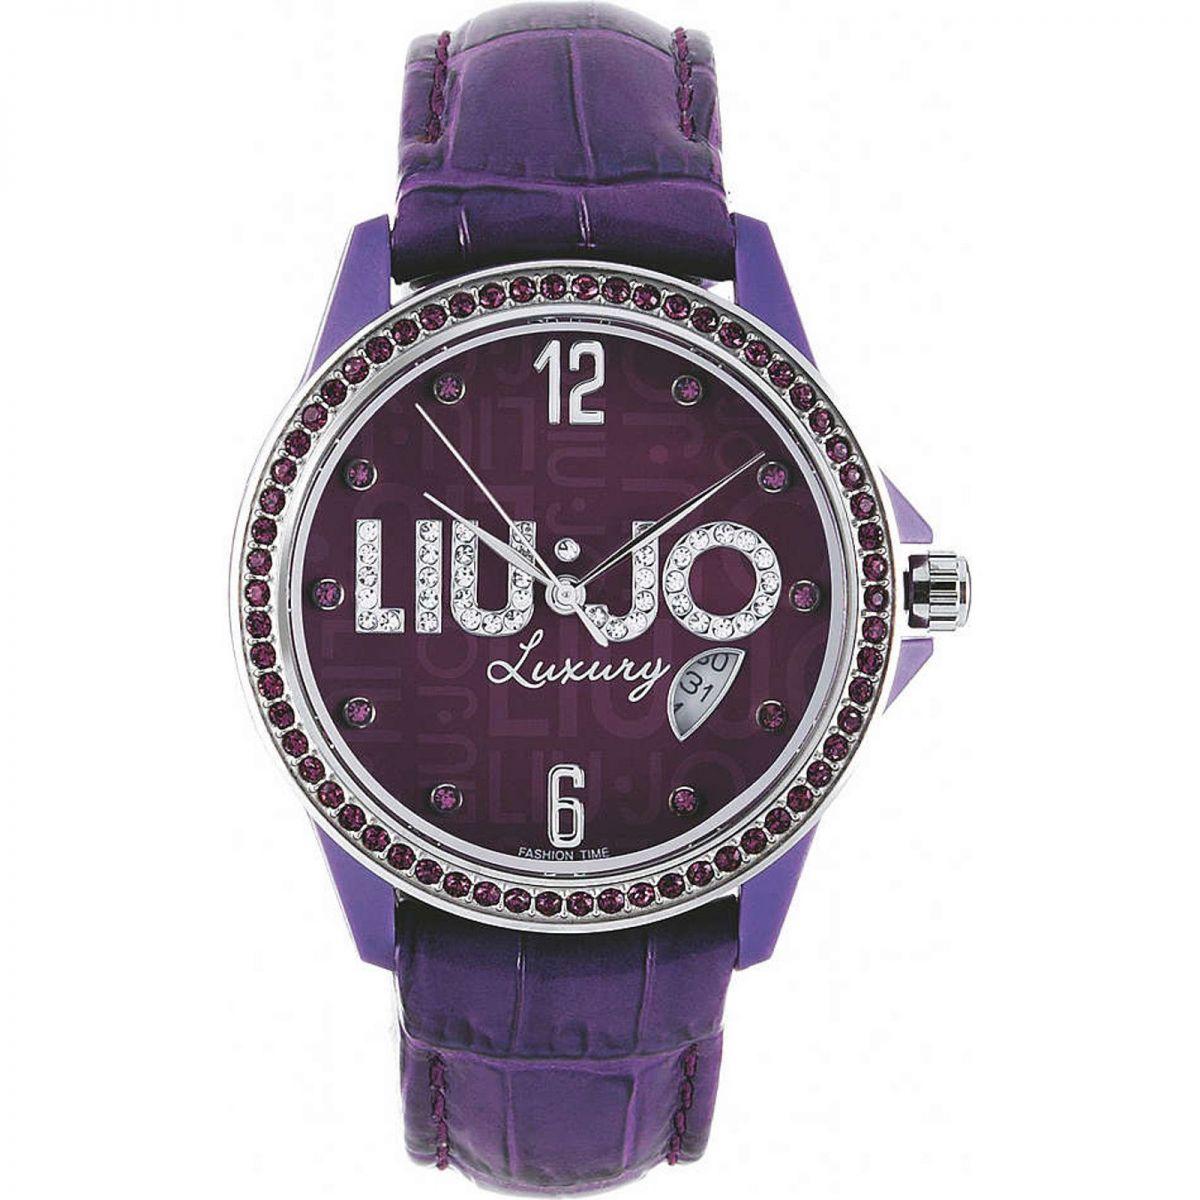 Orologio Liu Jo Luxury Colortime TLJ109